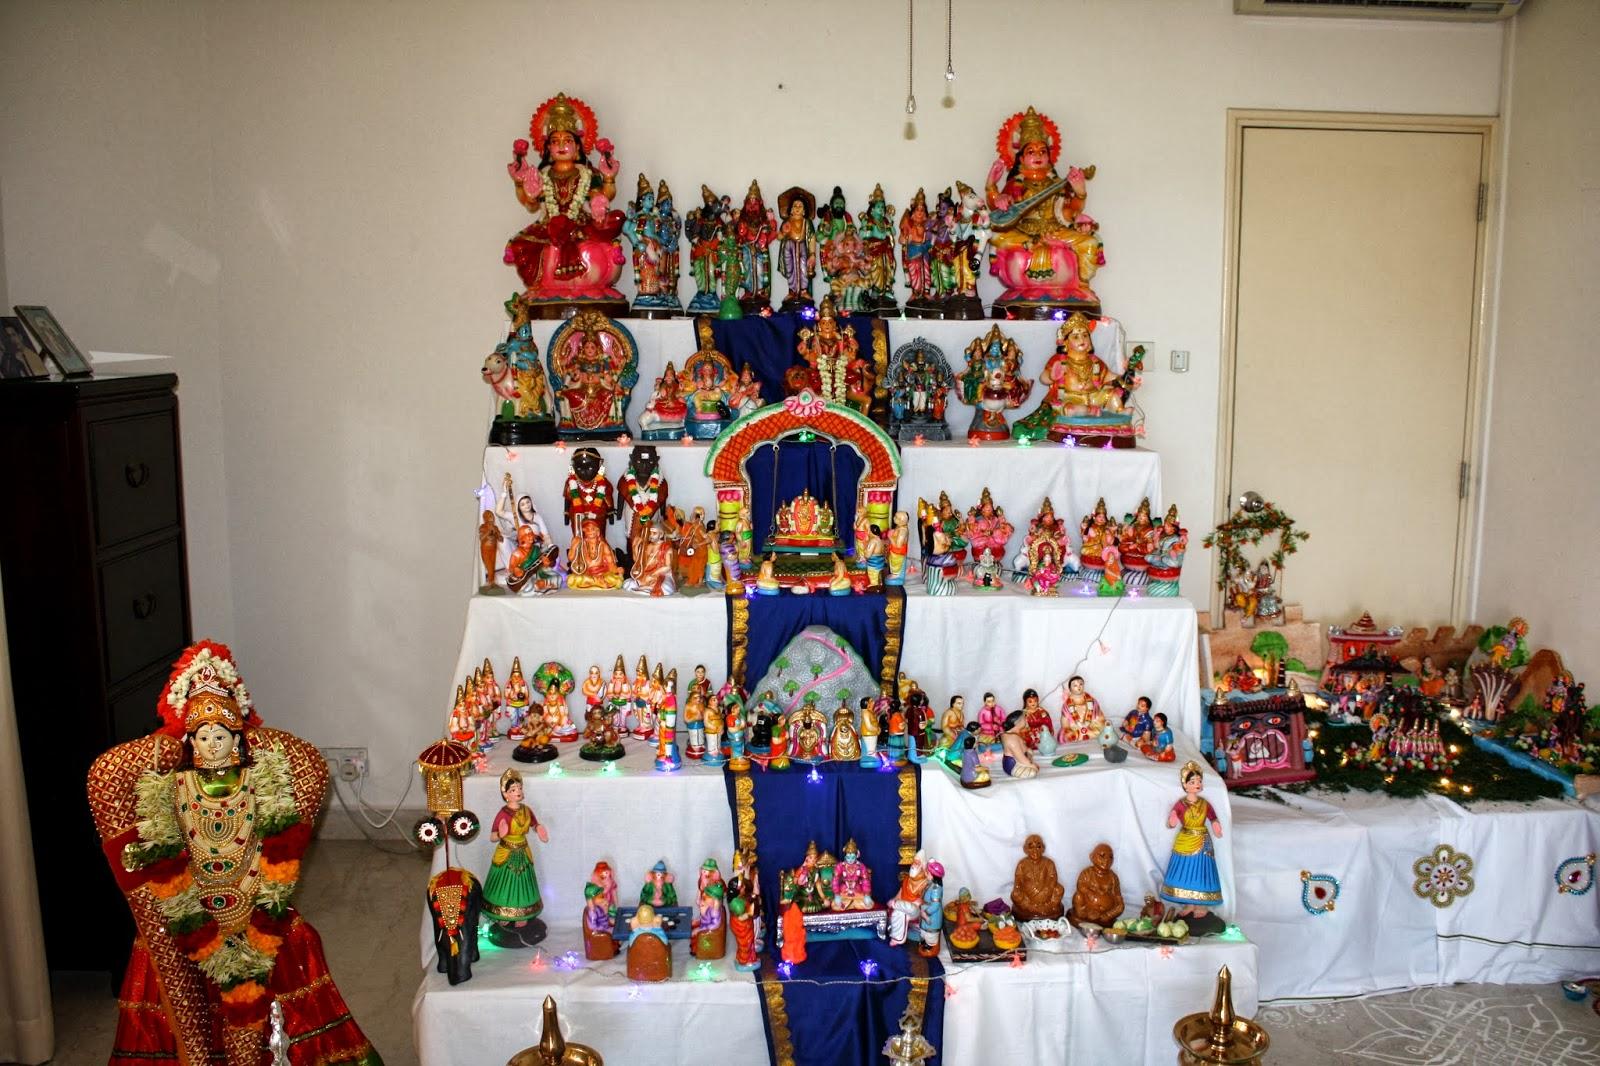 EC Indian Handicrafts Marapachirubber doll decorations